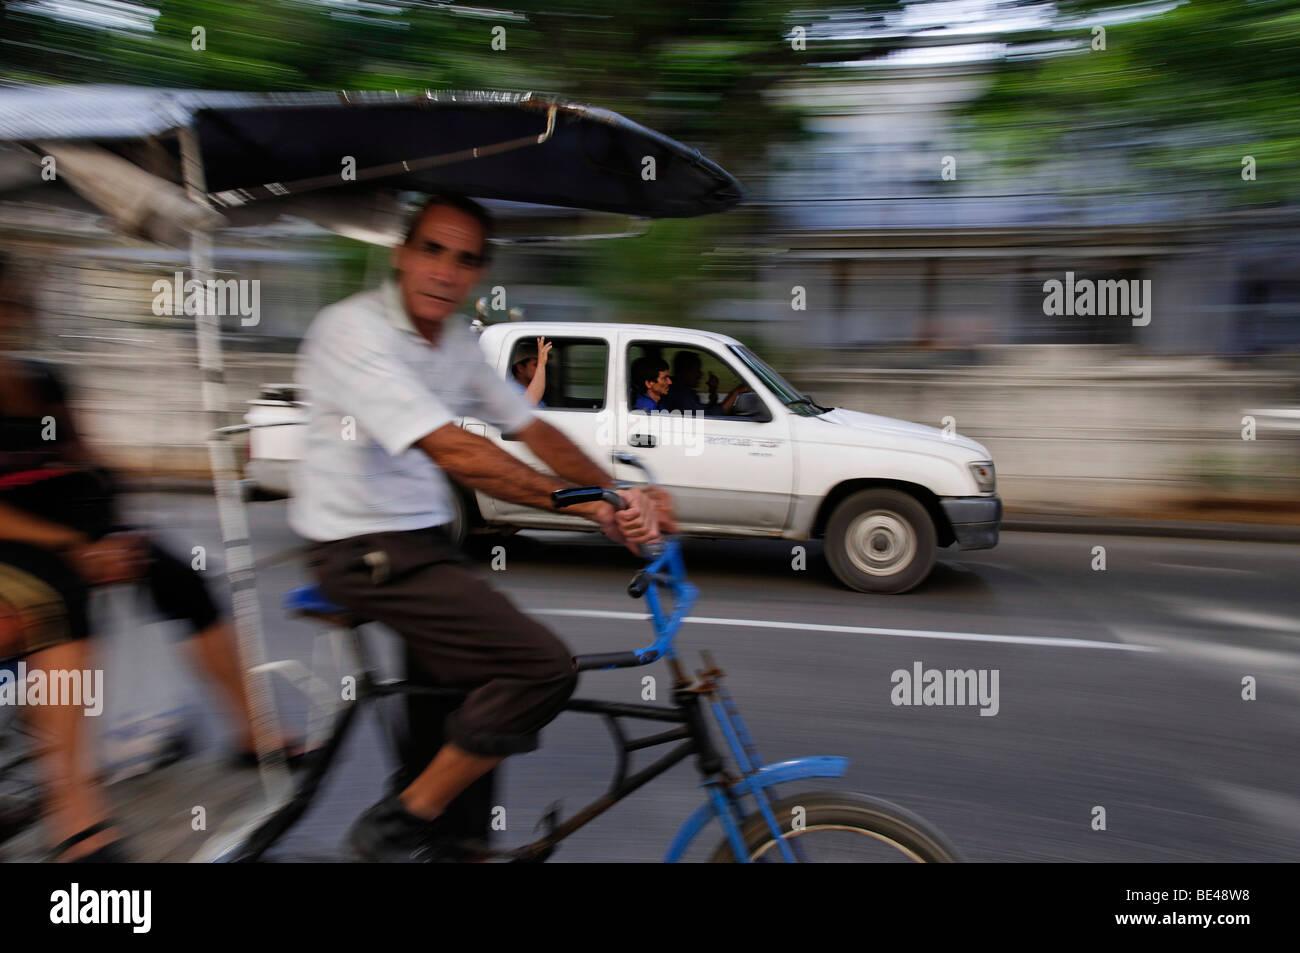 Cycle taxi motion blur, Havana, Cuba - Stock Image